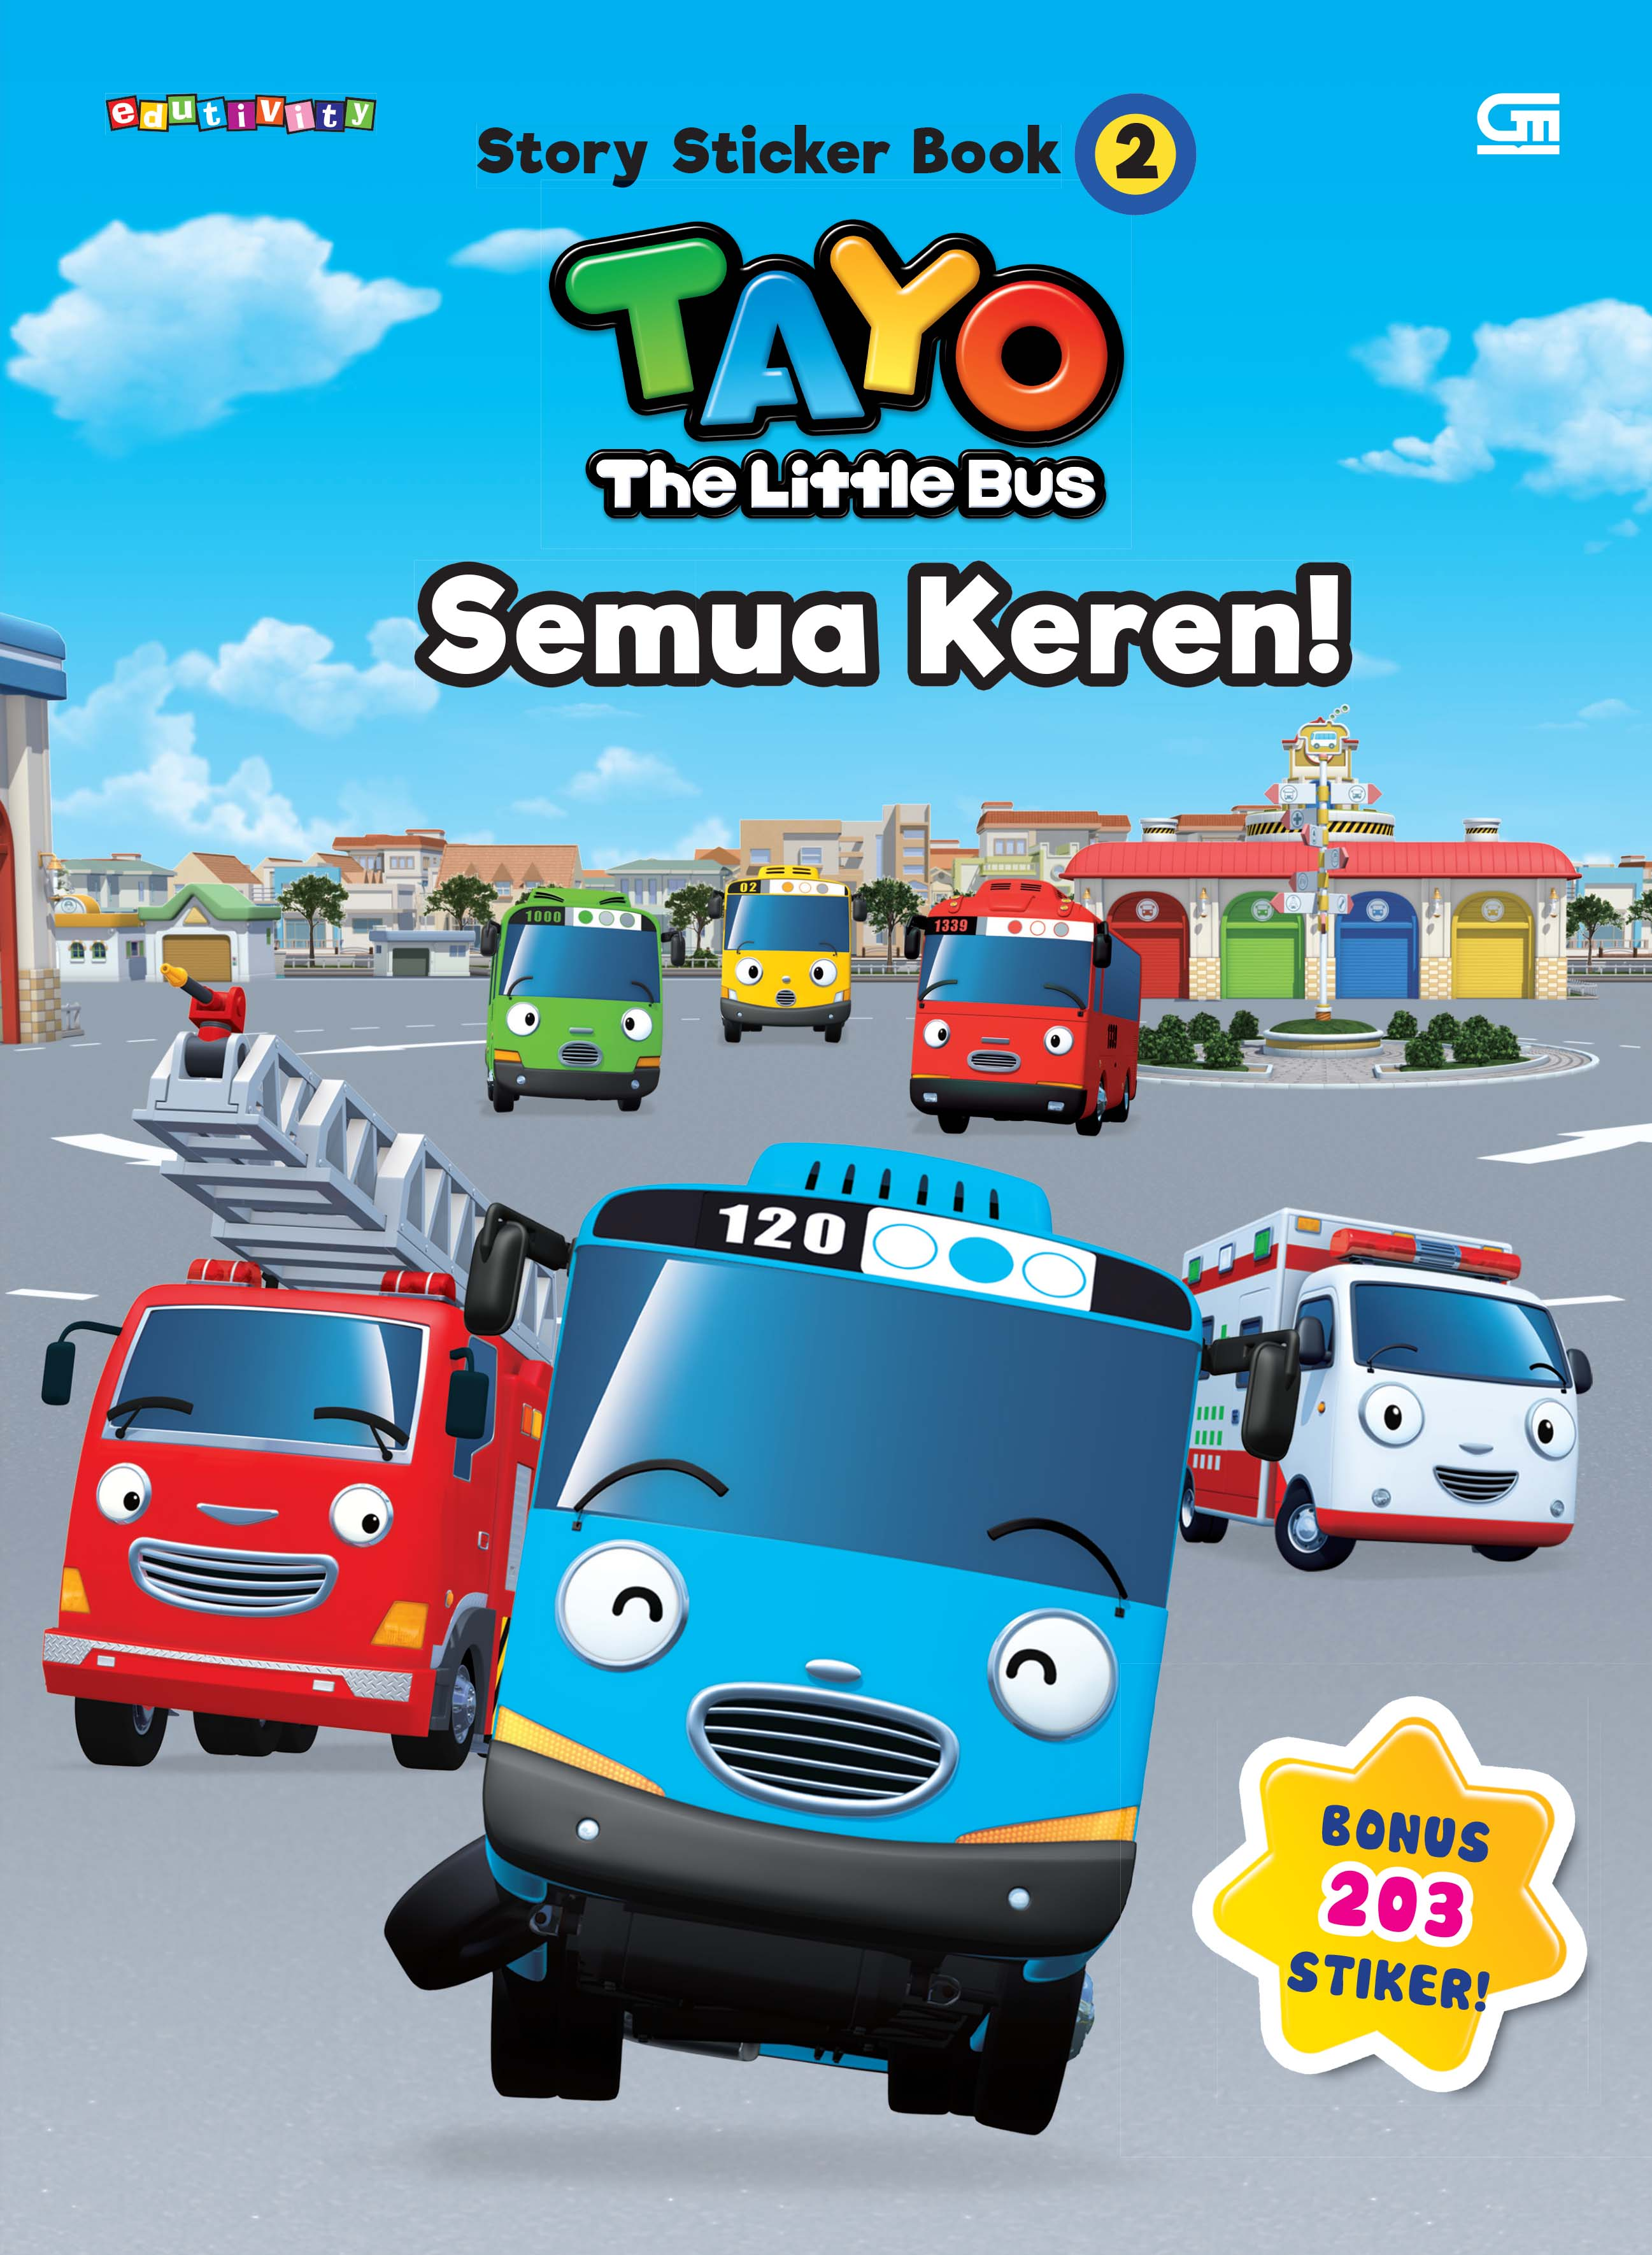 Tayo Story Sticker Book 2 - Tayo The Little Bus: Semua Keren!